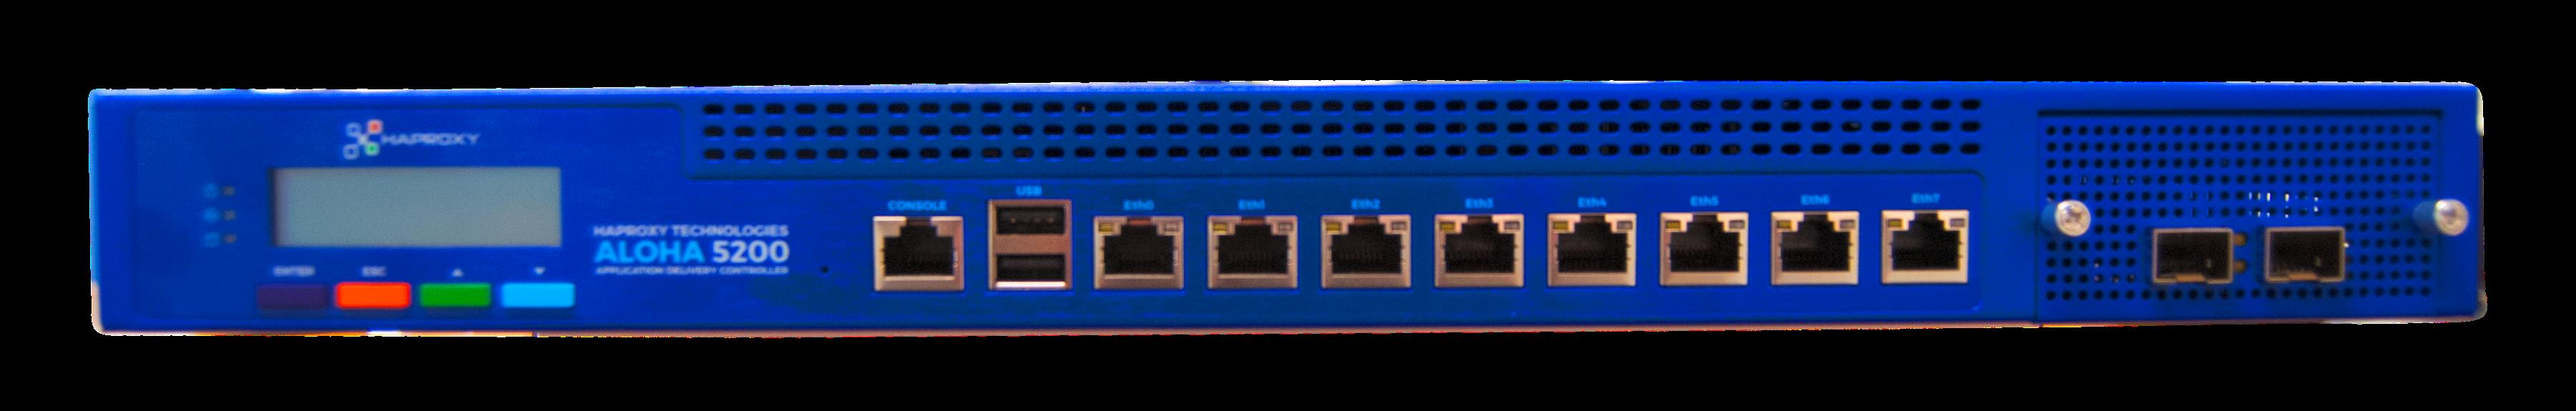 ALOHA ALB5200 Load Balancer (Front side)